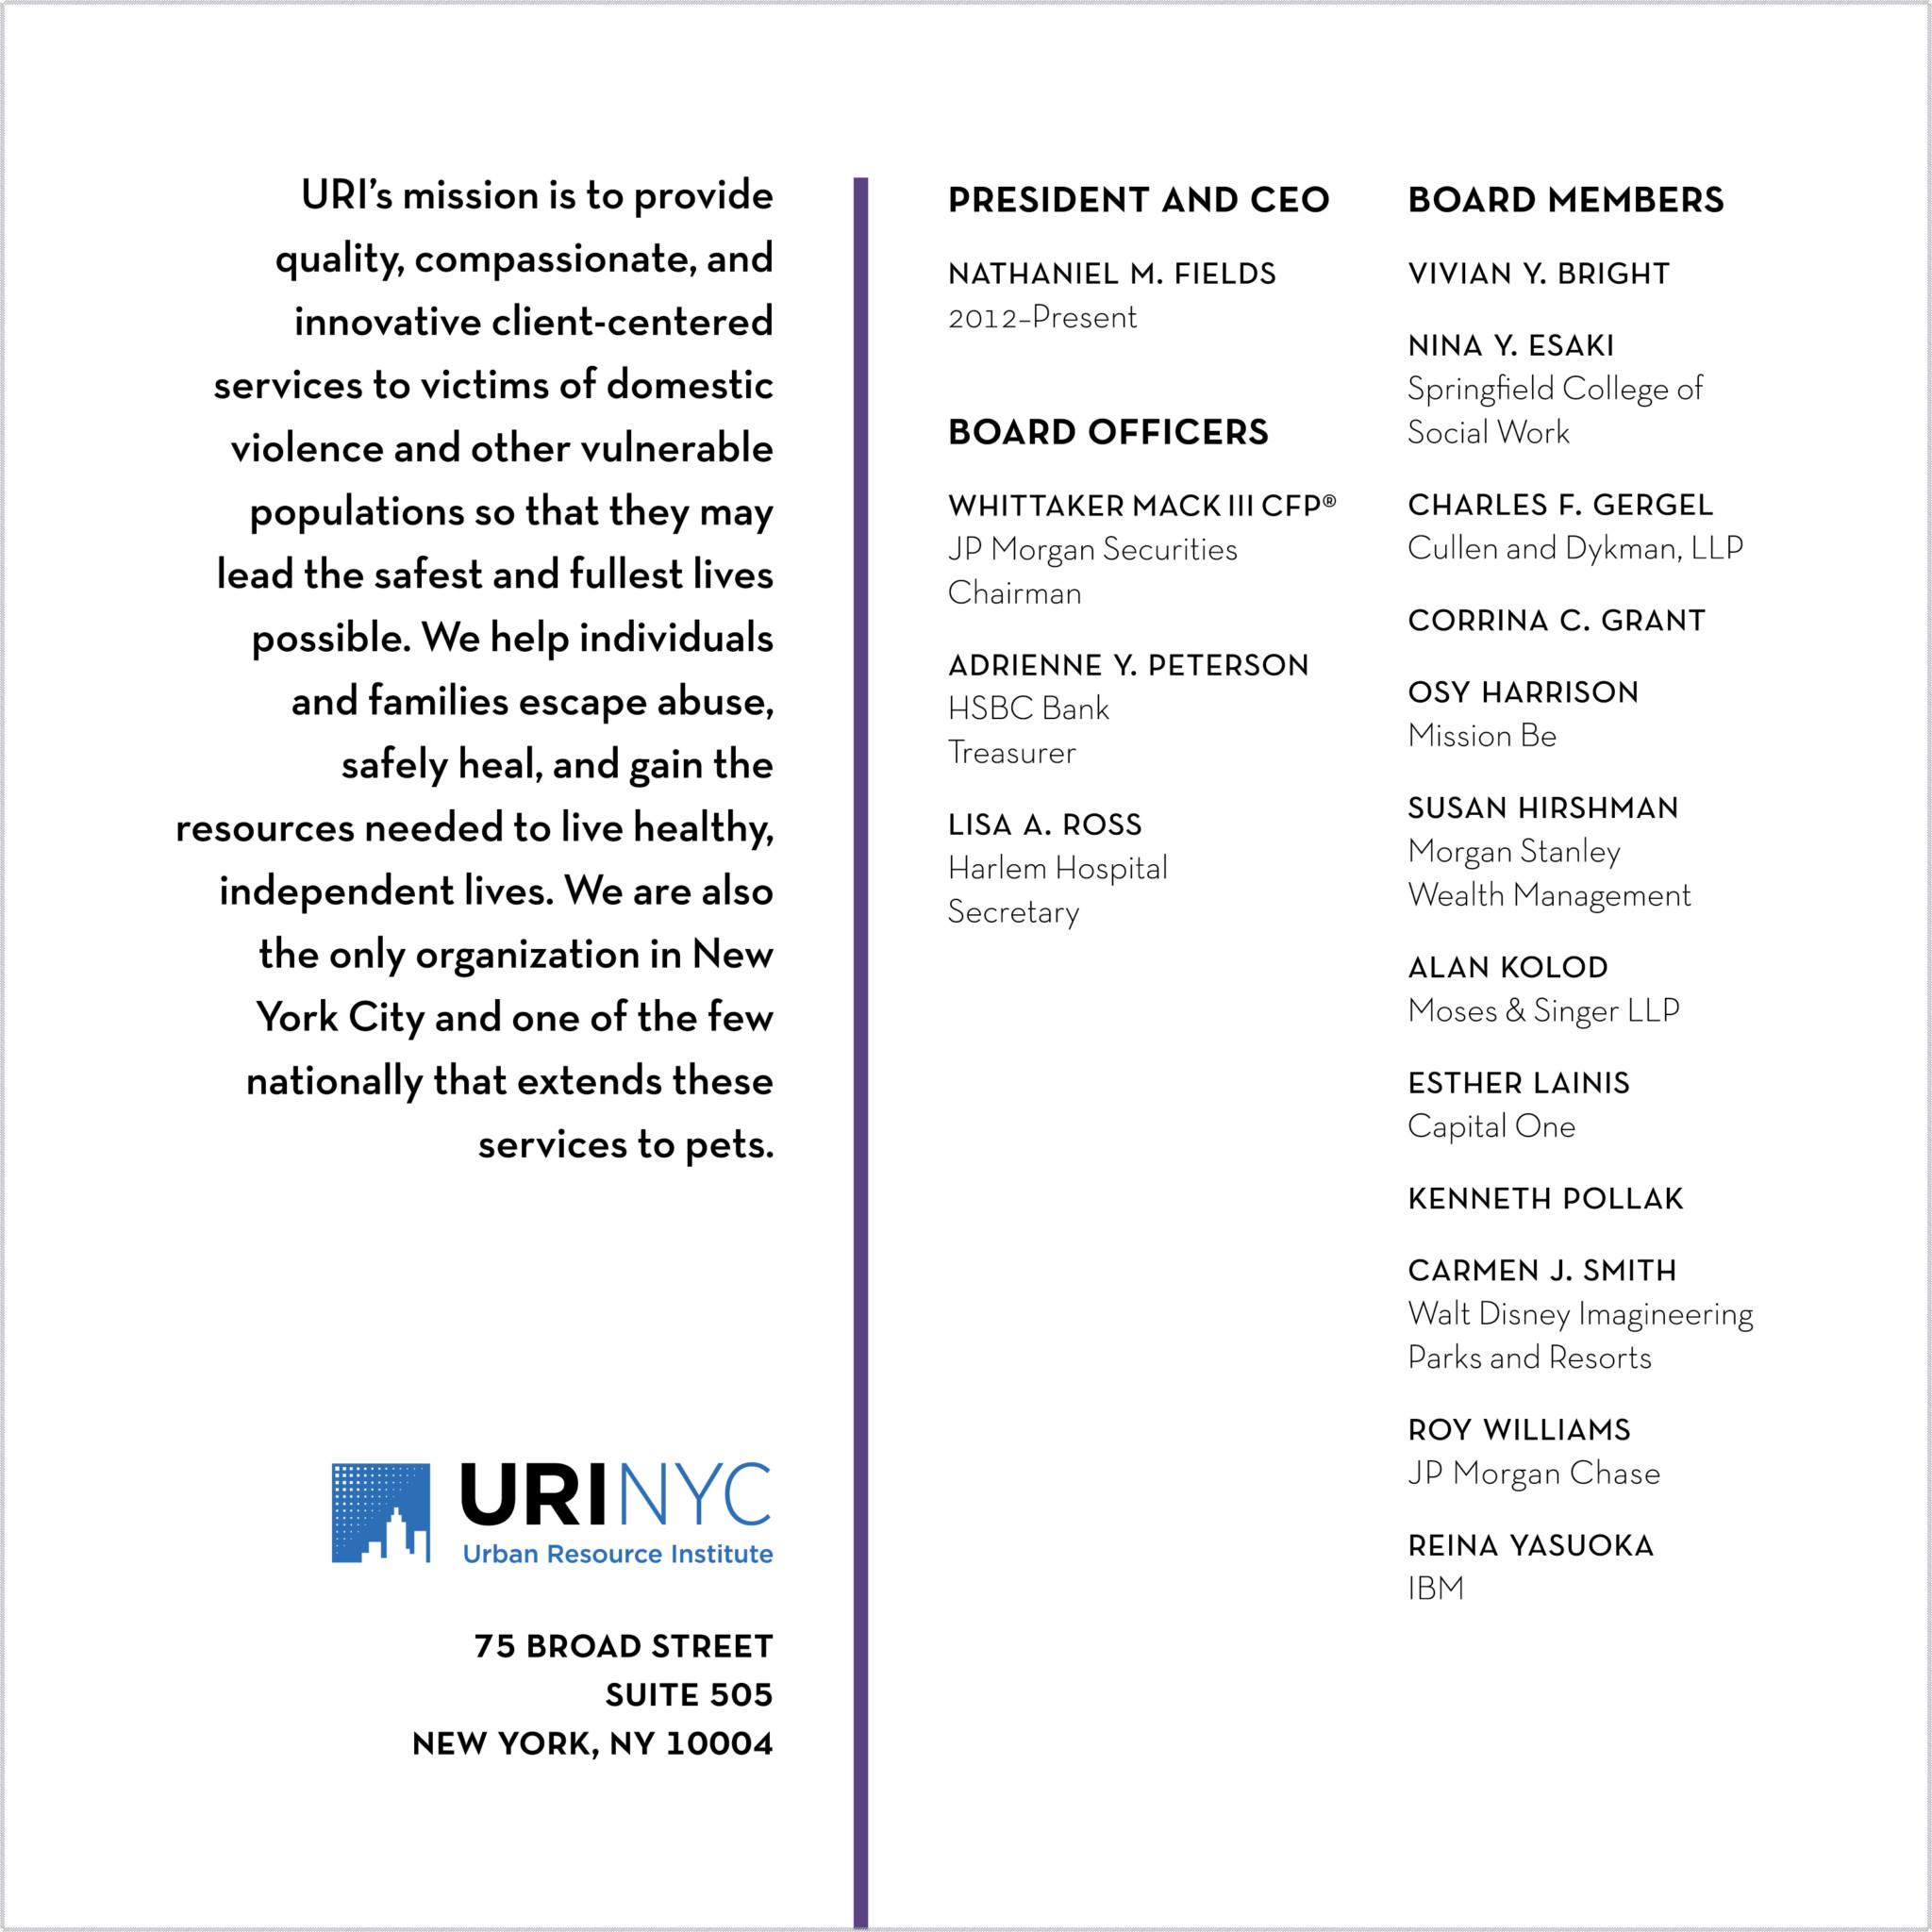 List of board members